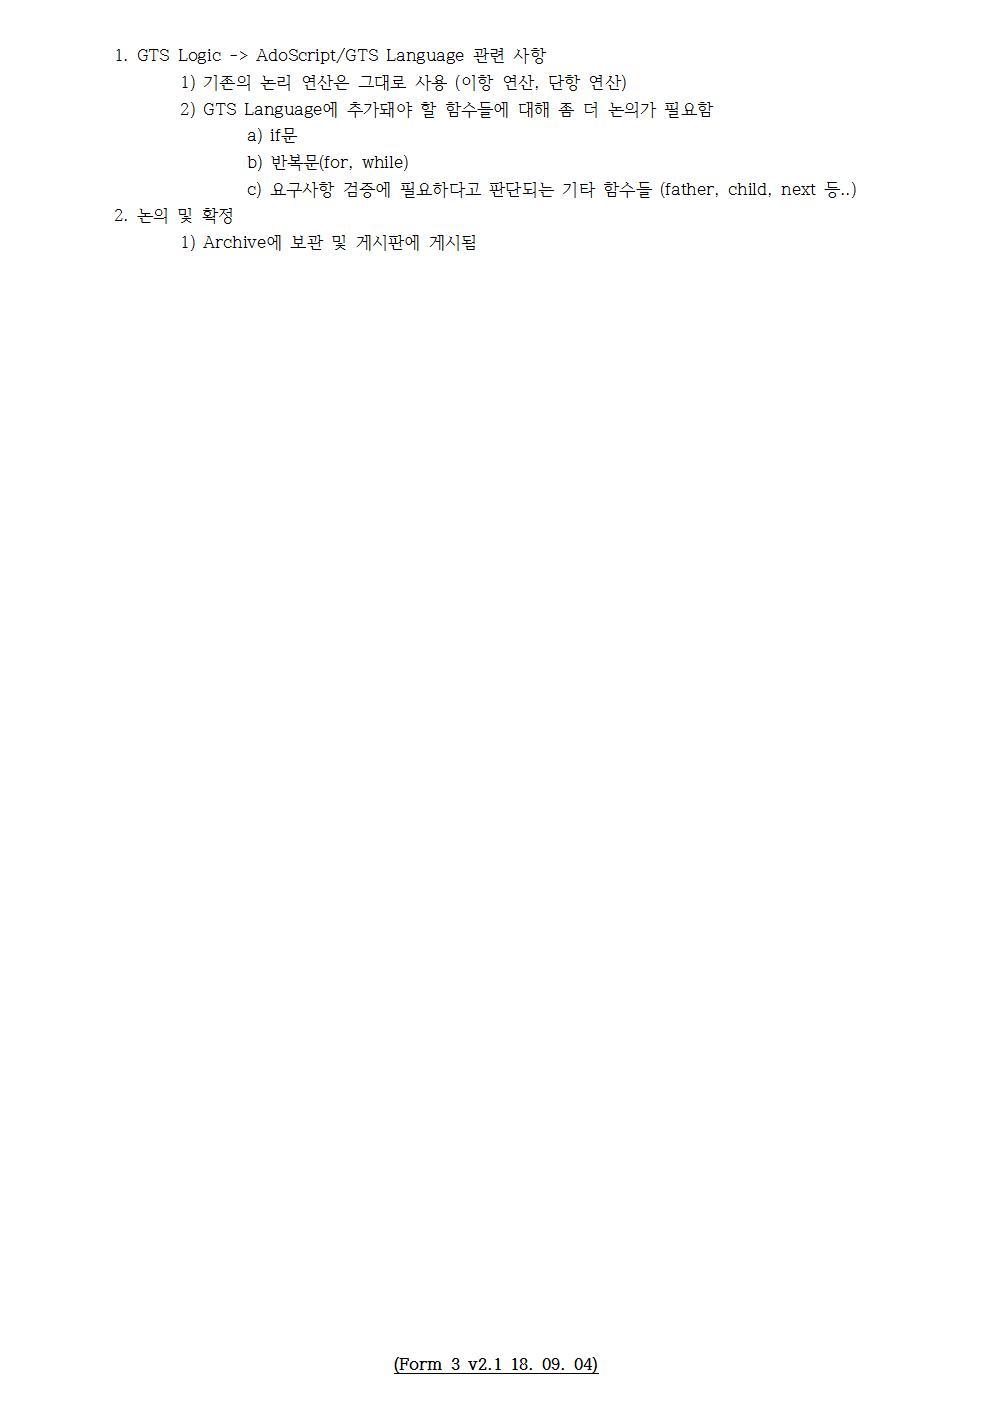 D-[18-001-RD-01]-[SAVE 3.0]-[2018-09-13][SH]002.jpg